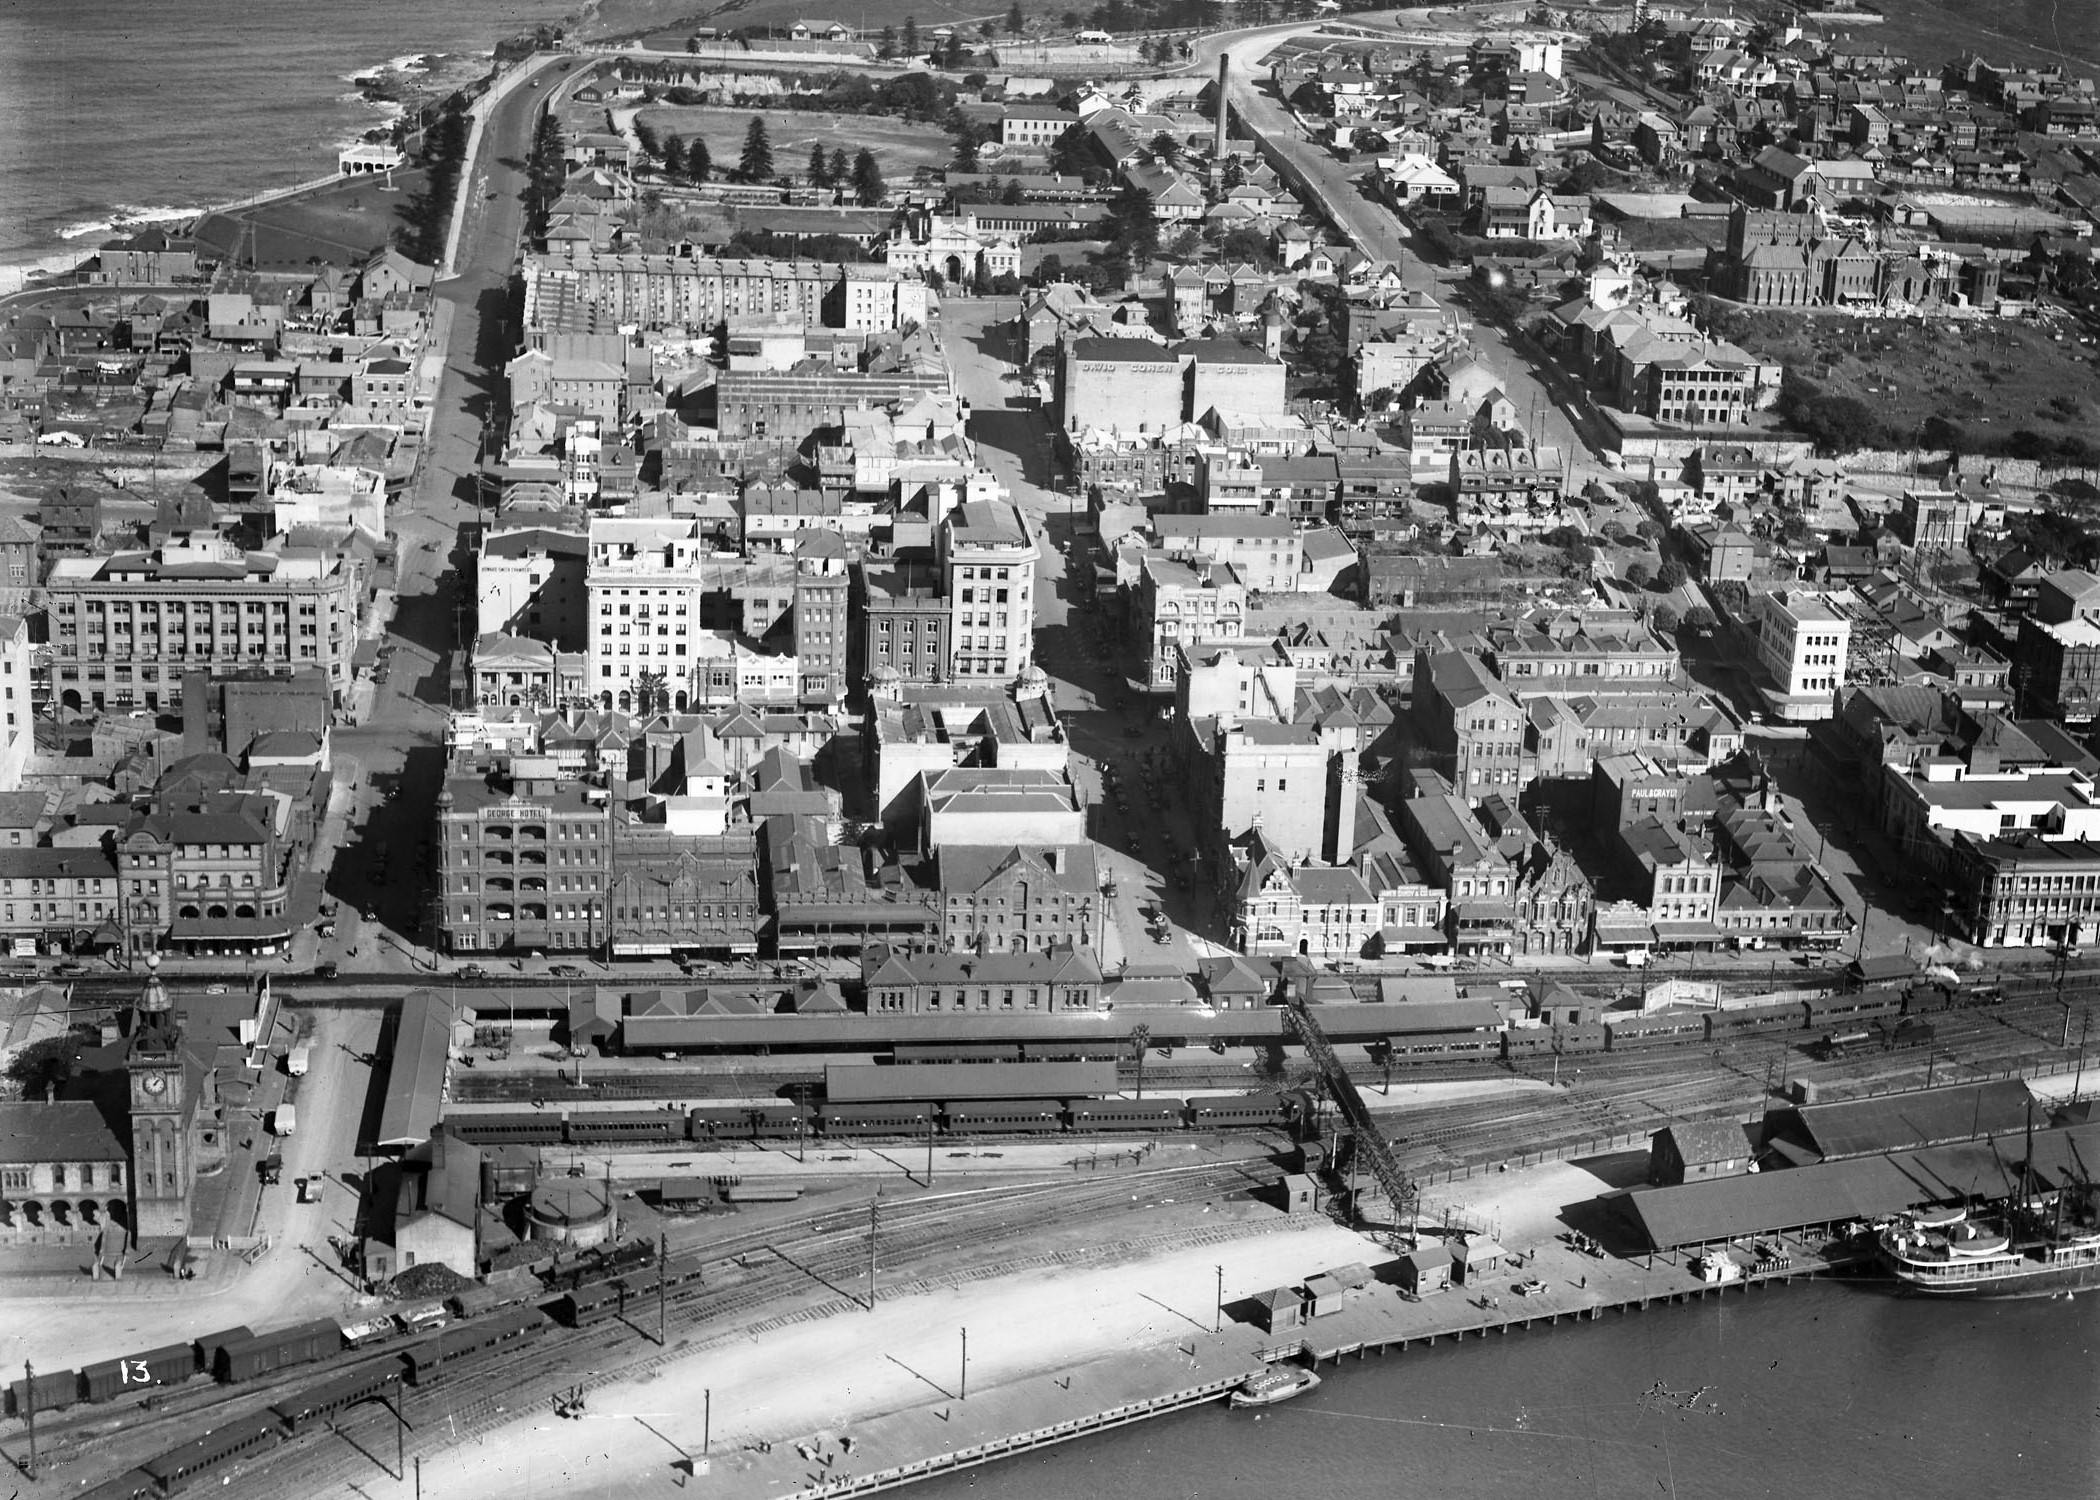 Newcastle aerial, 1935 (Image 67 Courtesy of Phillip Warren)